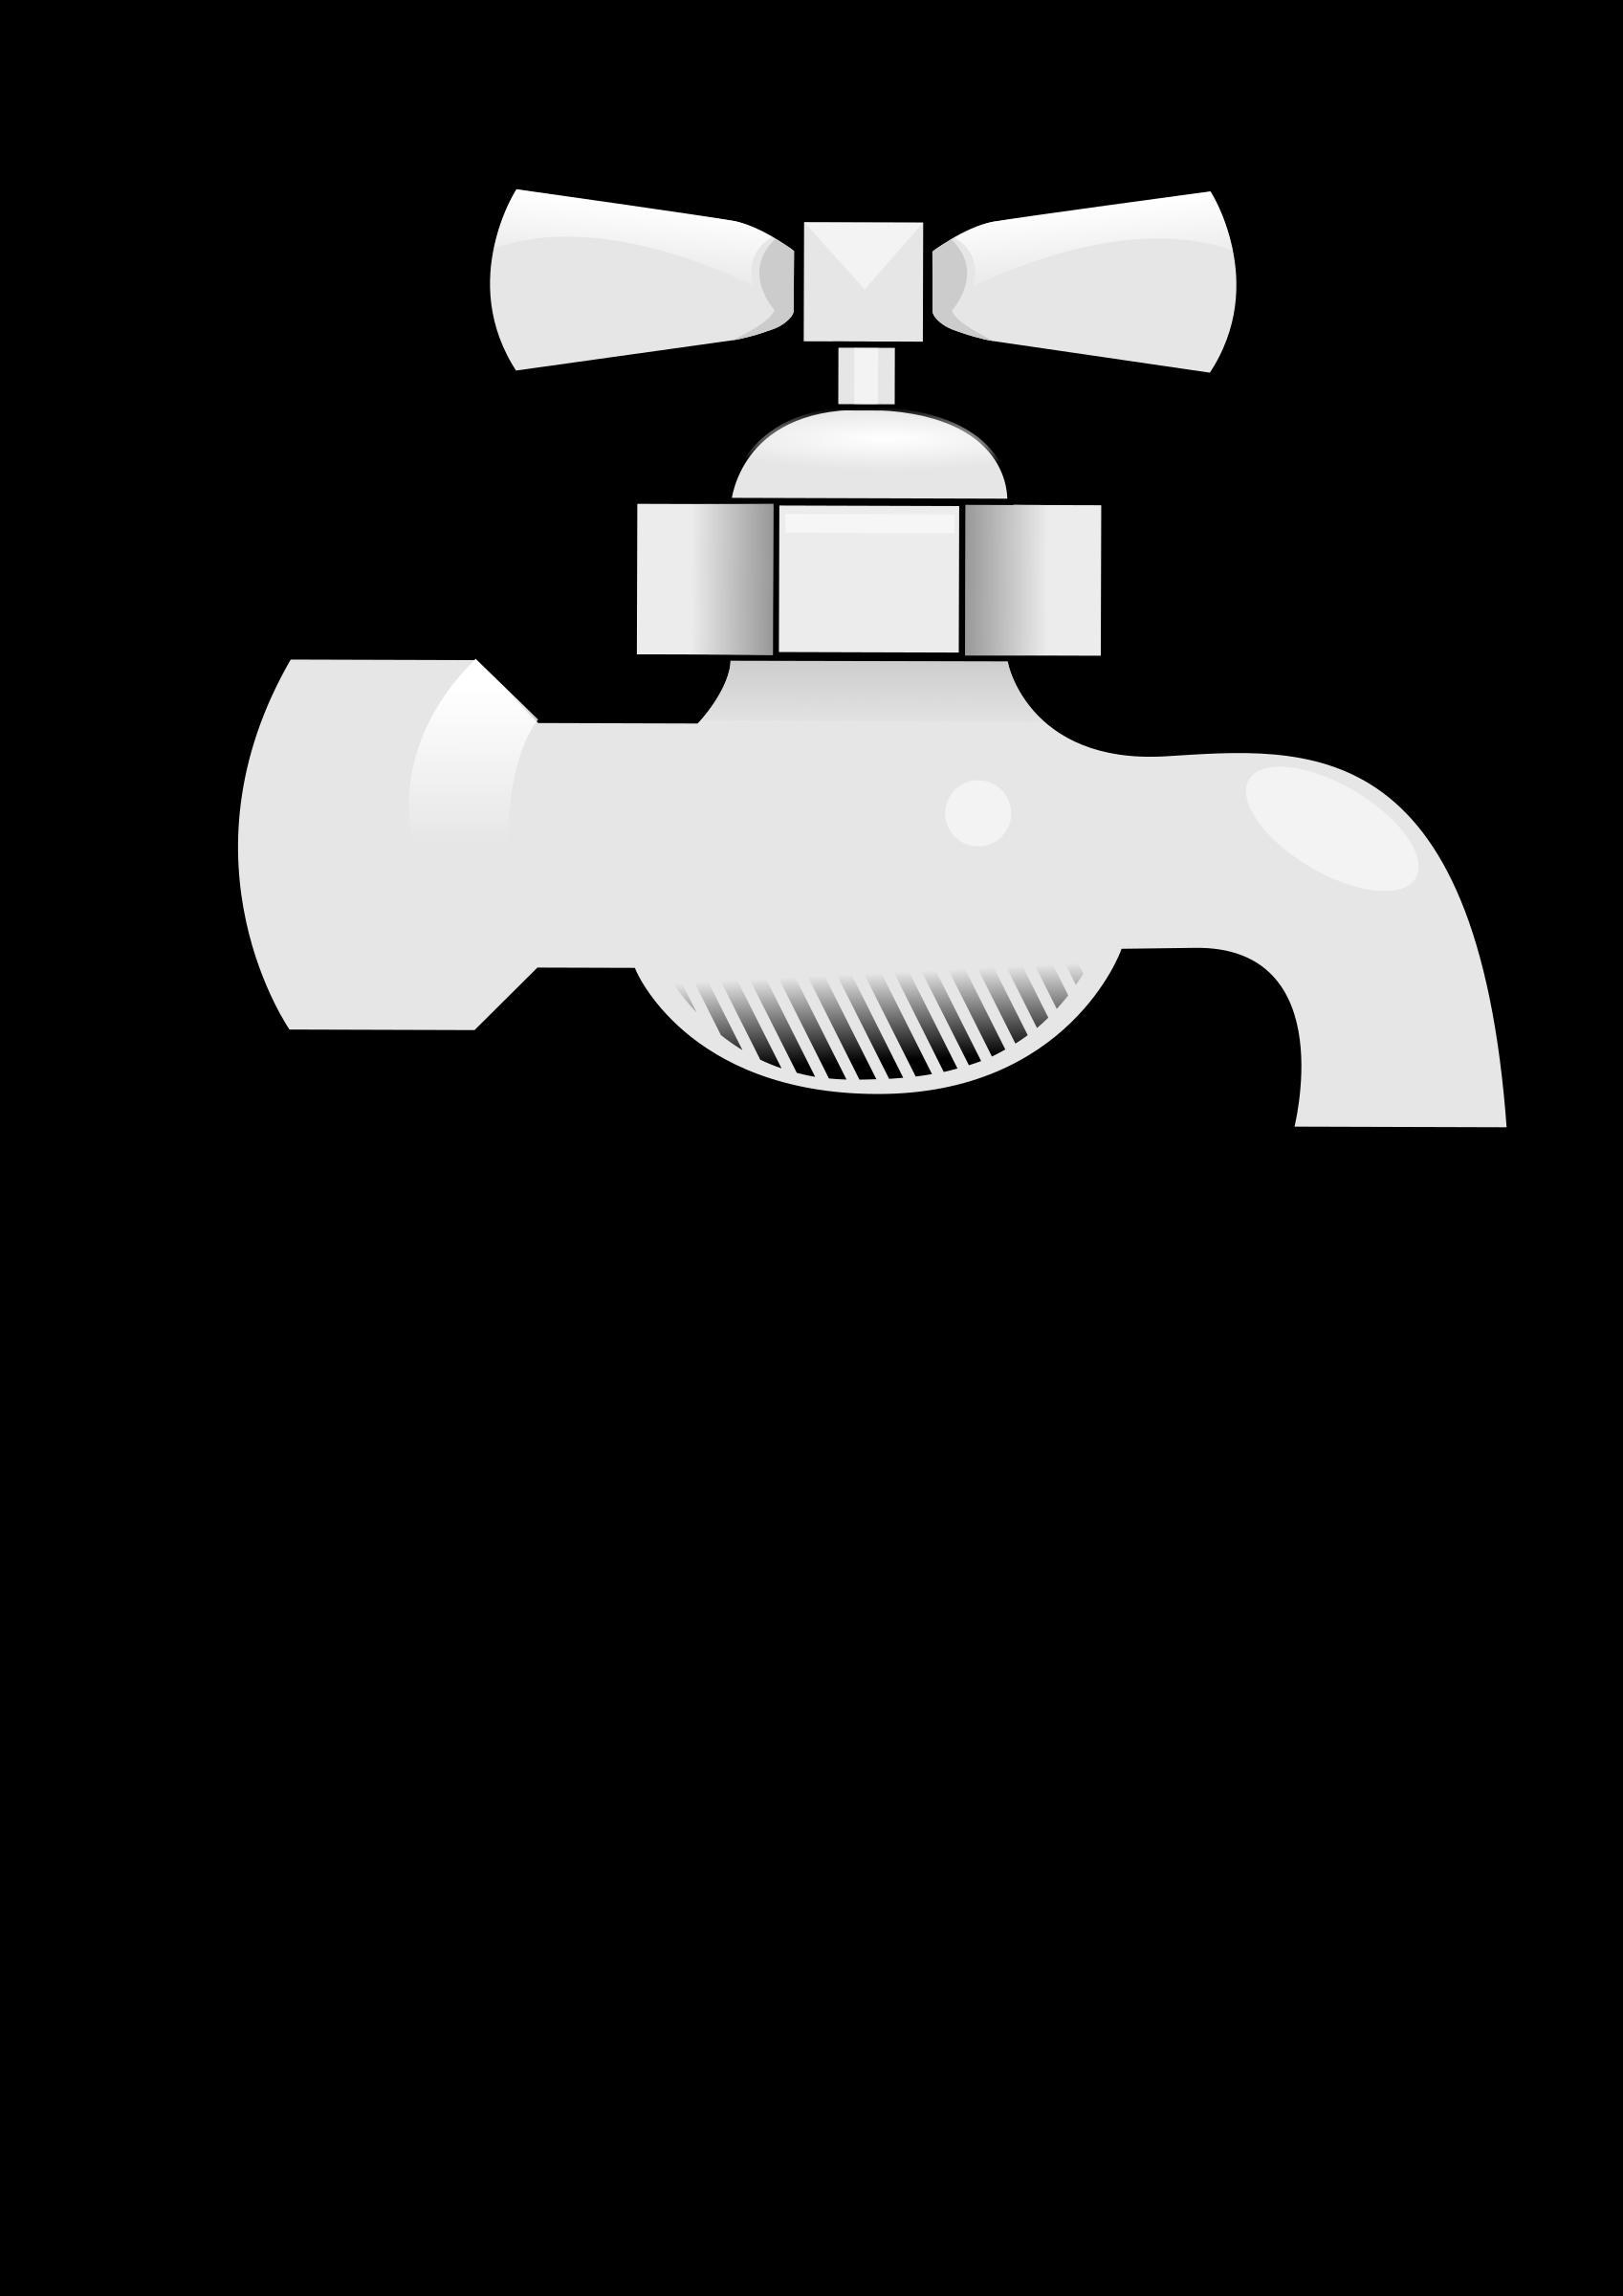 Faucet clipart water faucet. Grifo big image png